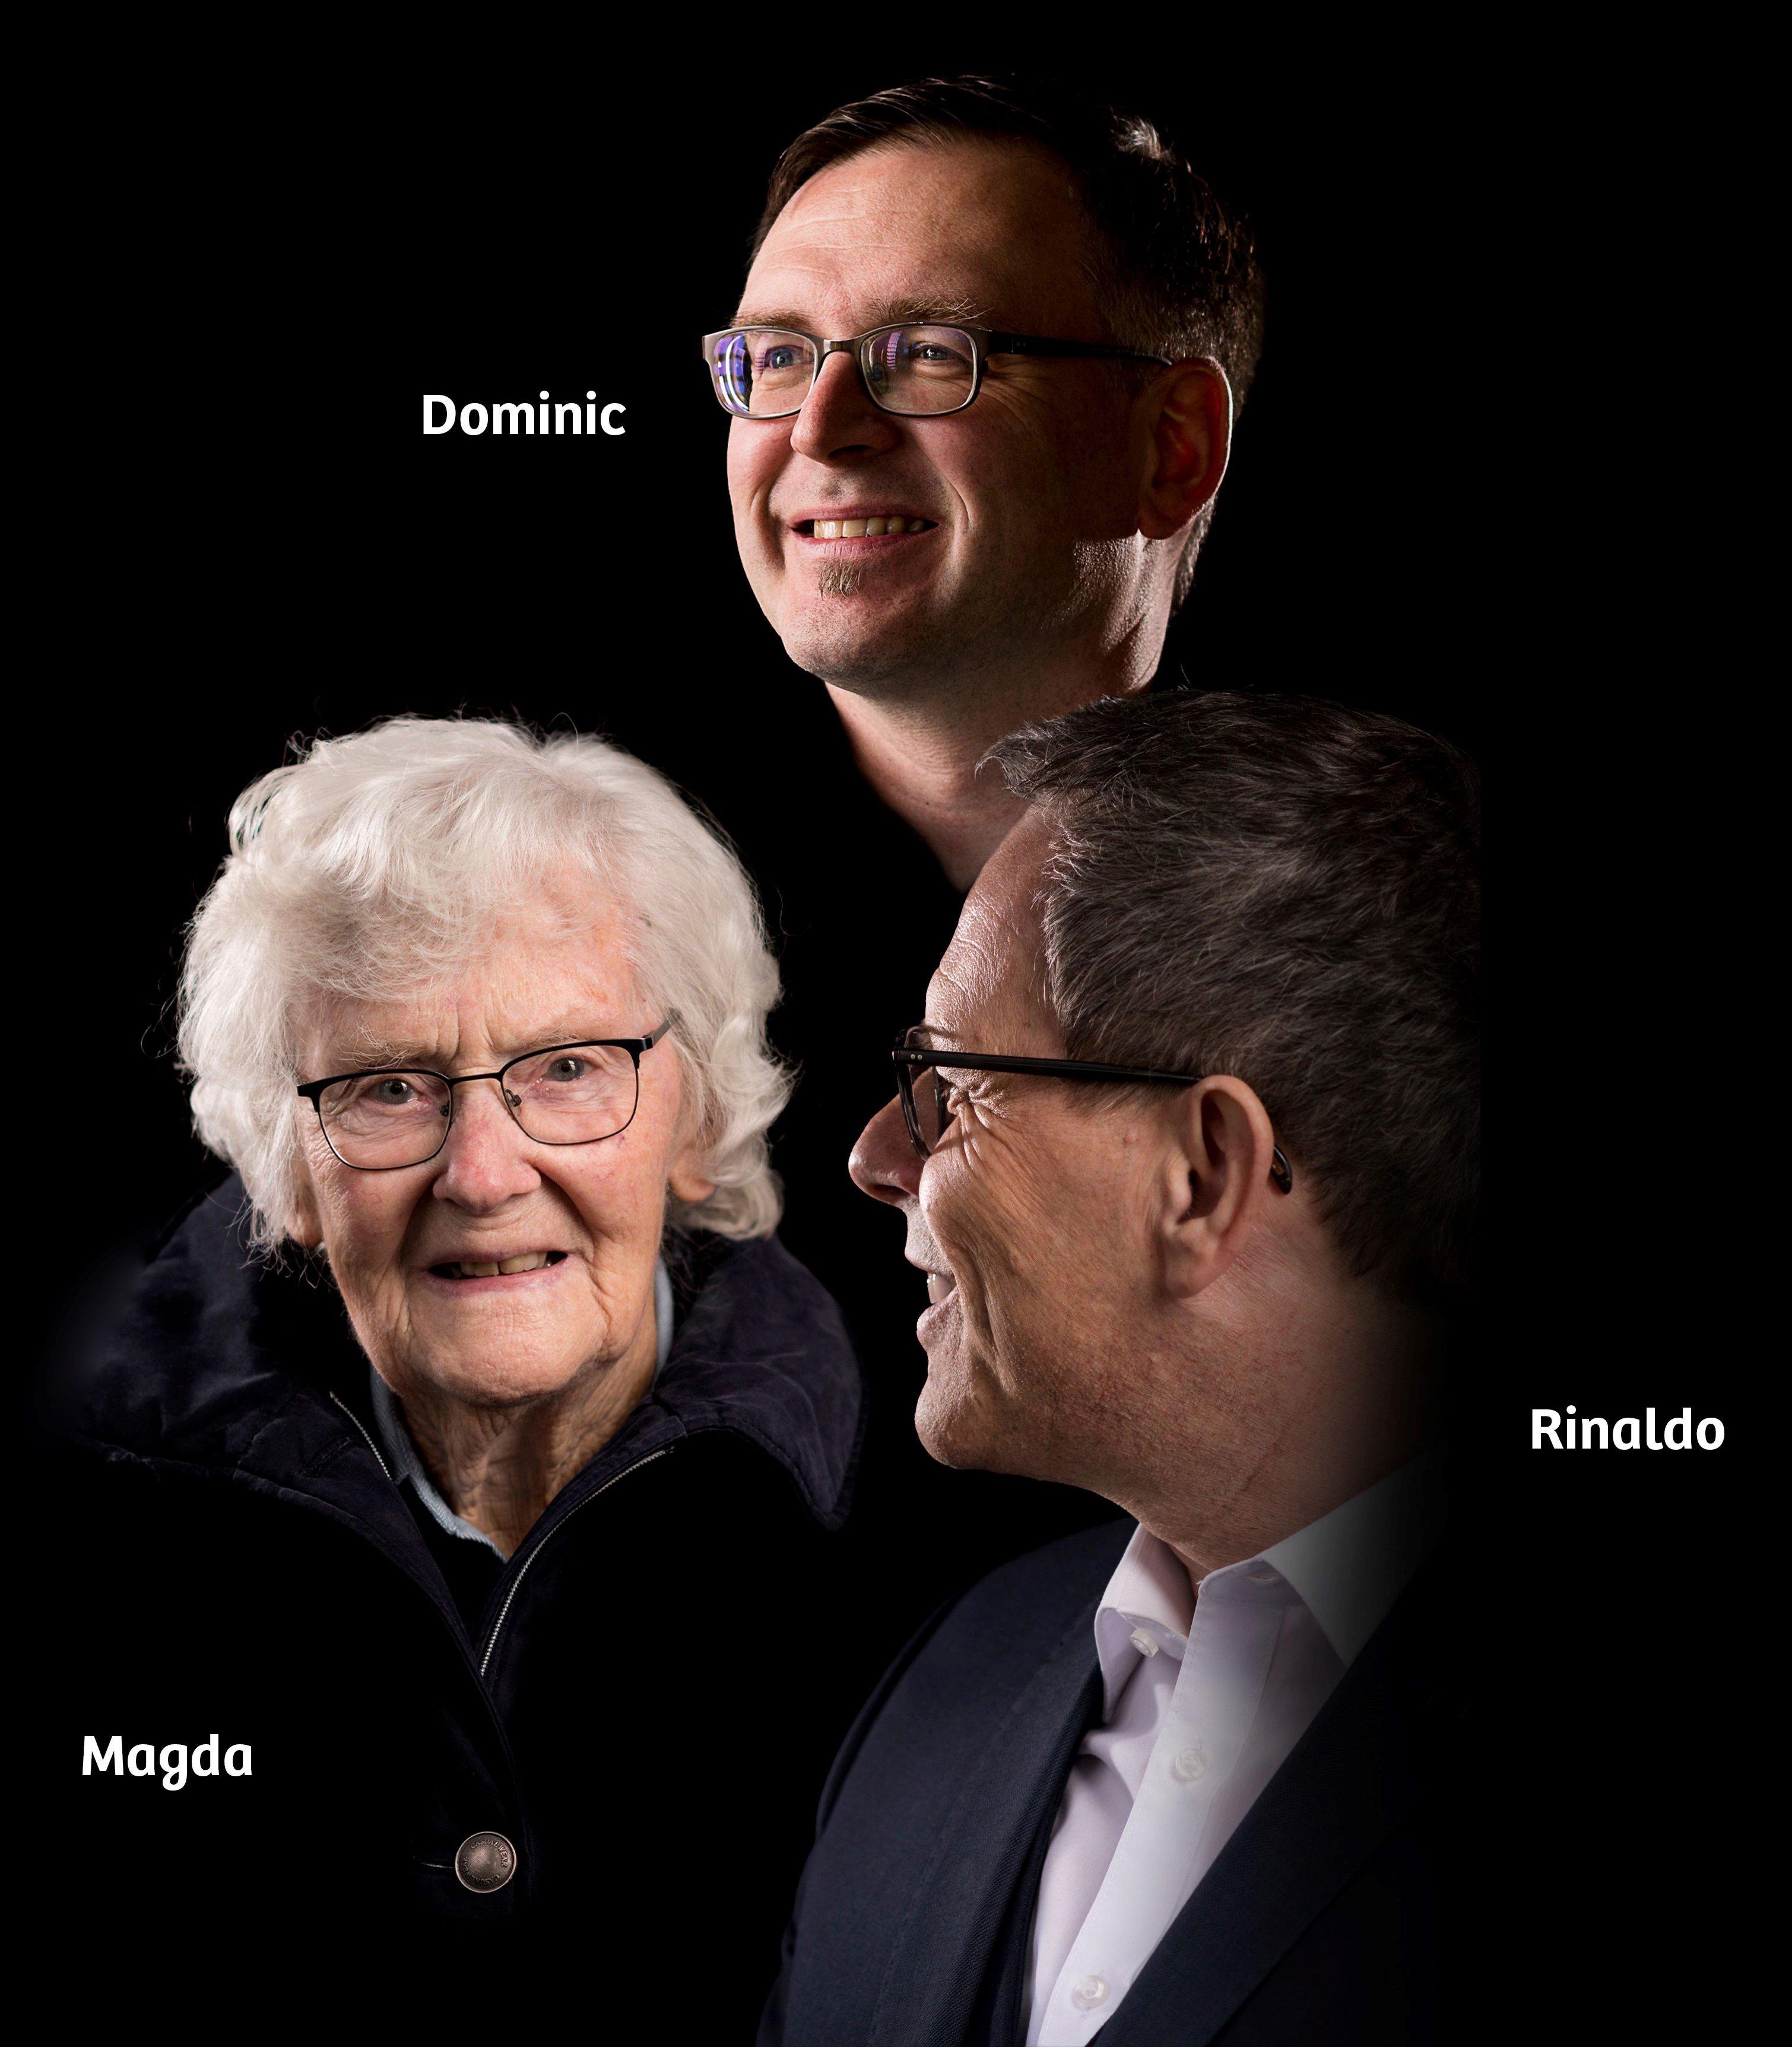 Magda, Dominic und Rinaldo